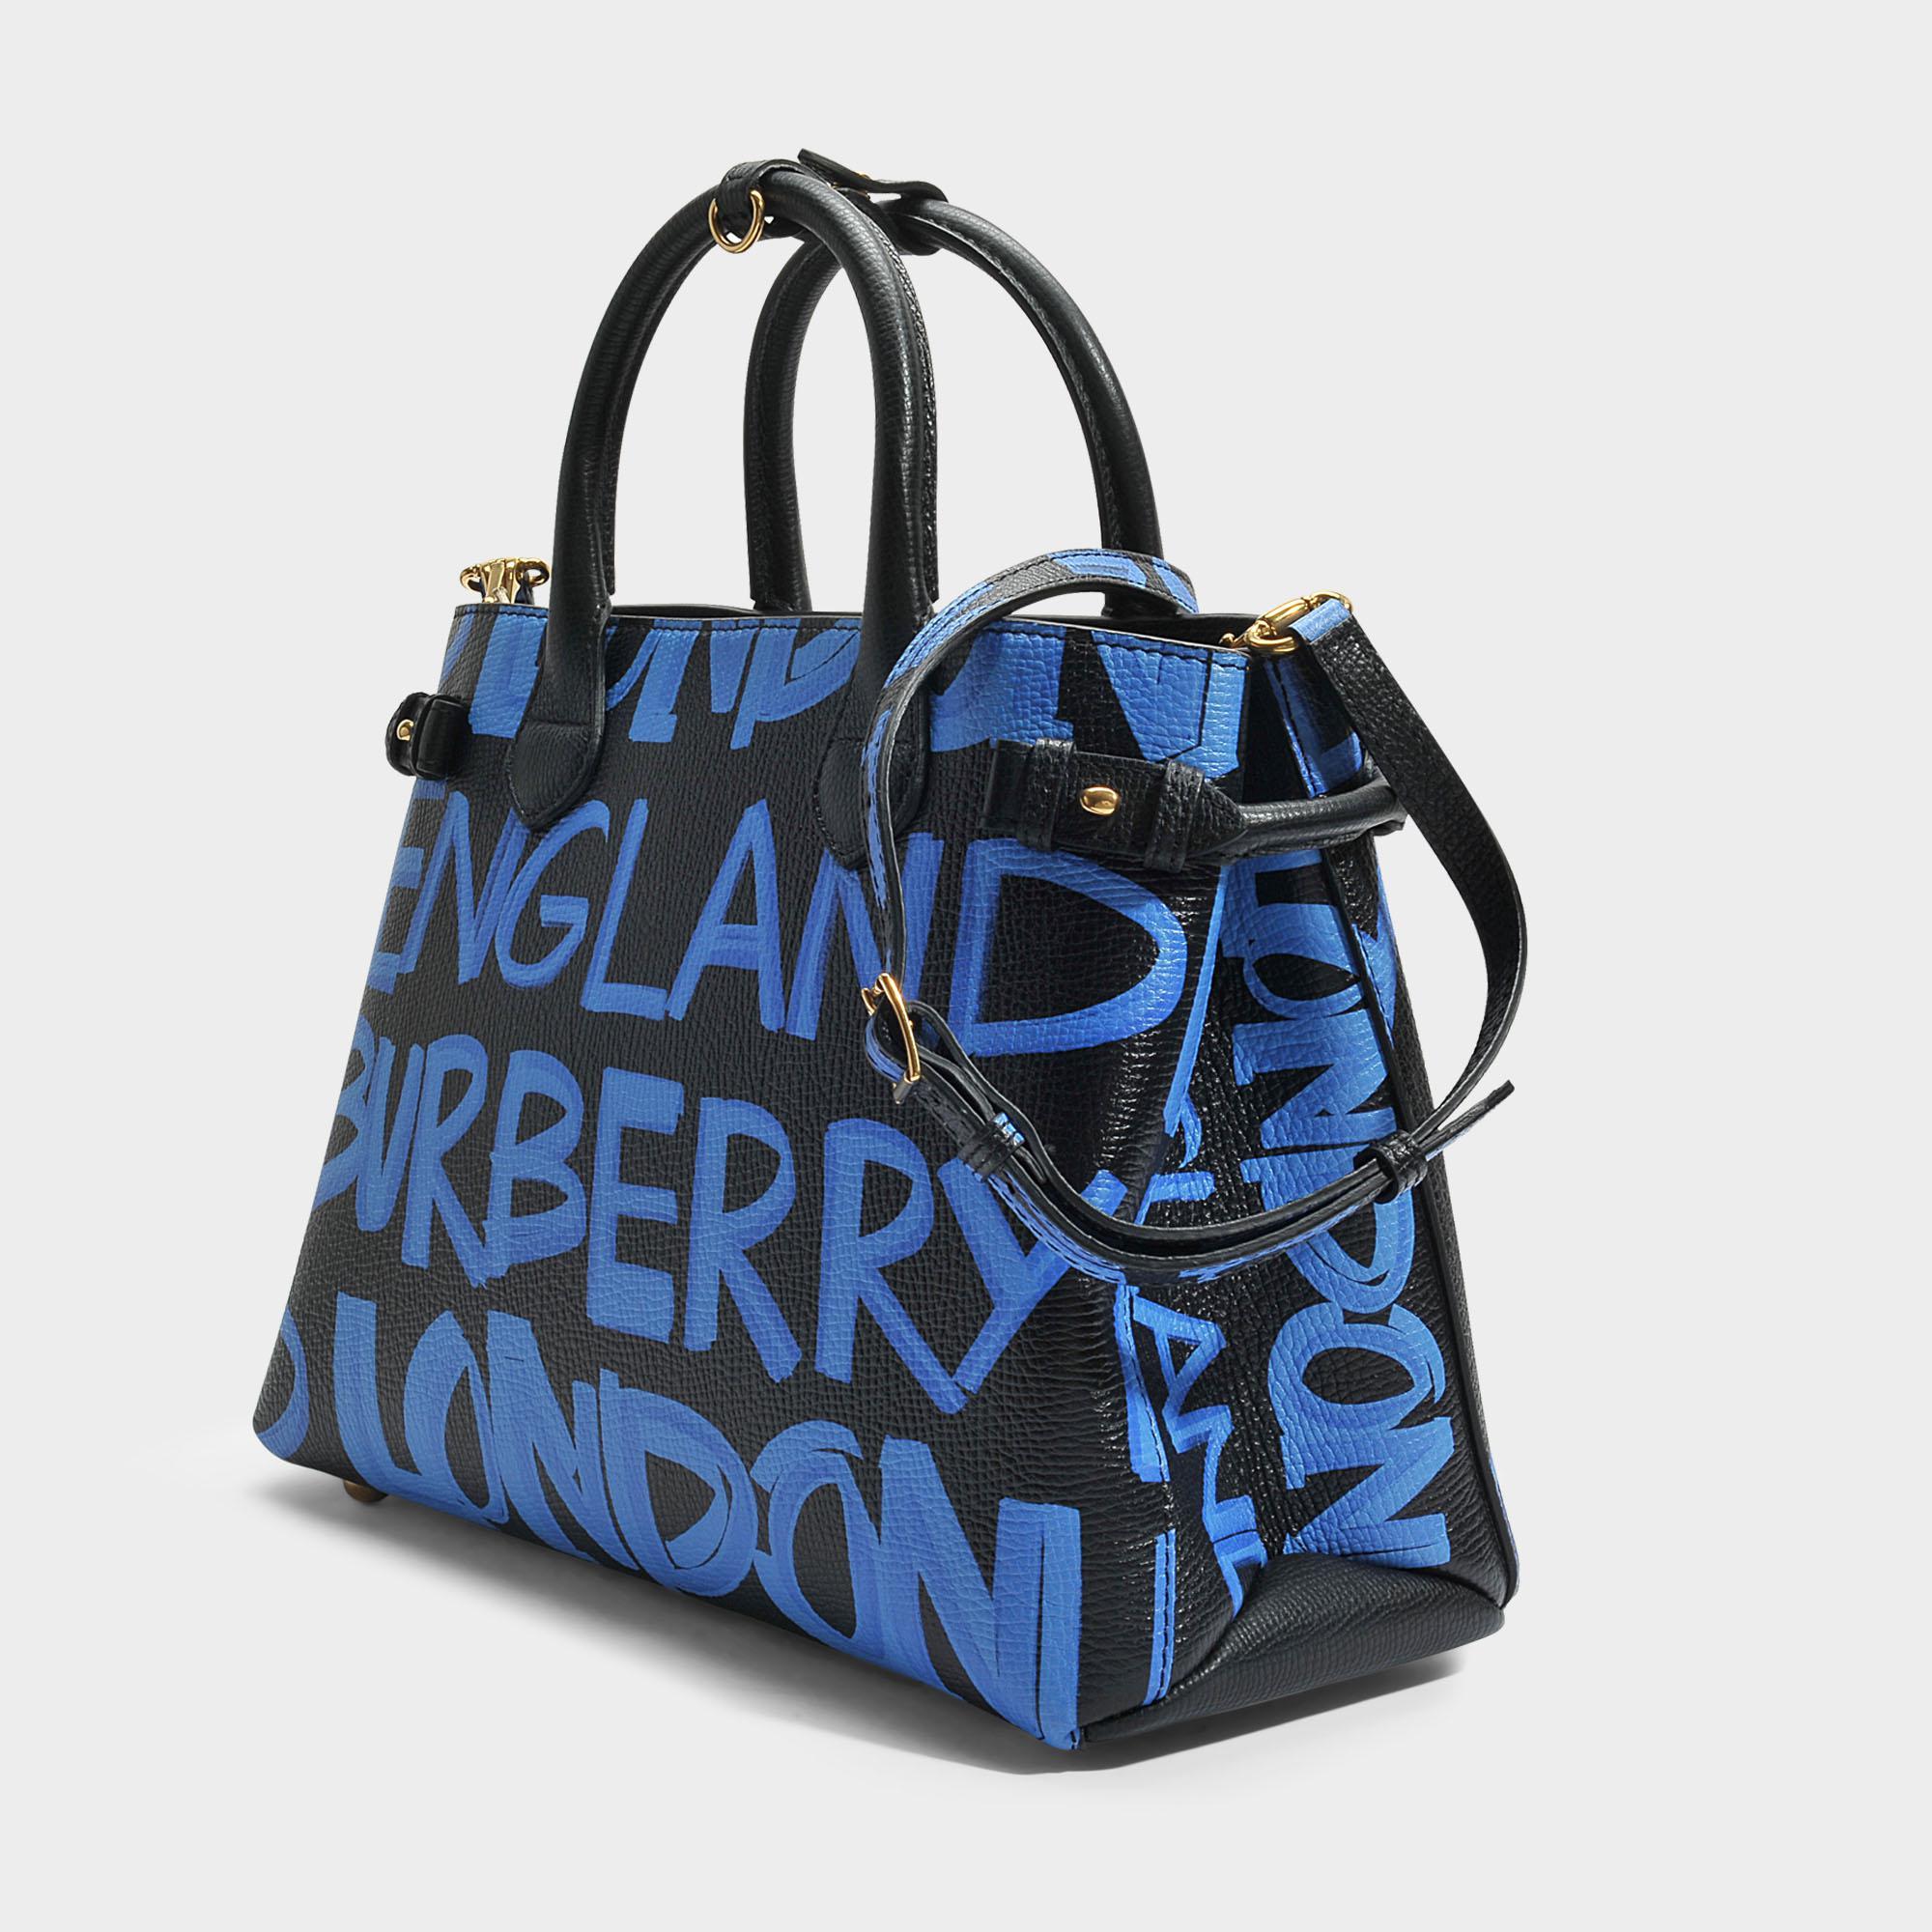 Medium Banner Graffiti Print Bag in Black Leather Graffiti Print Burberry tDUv8Dq